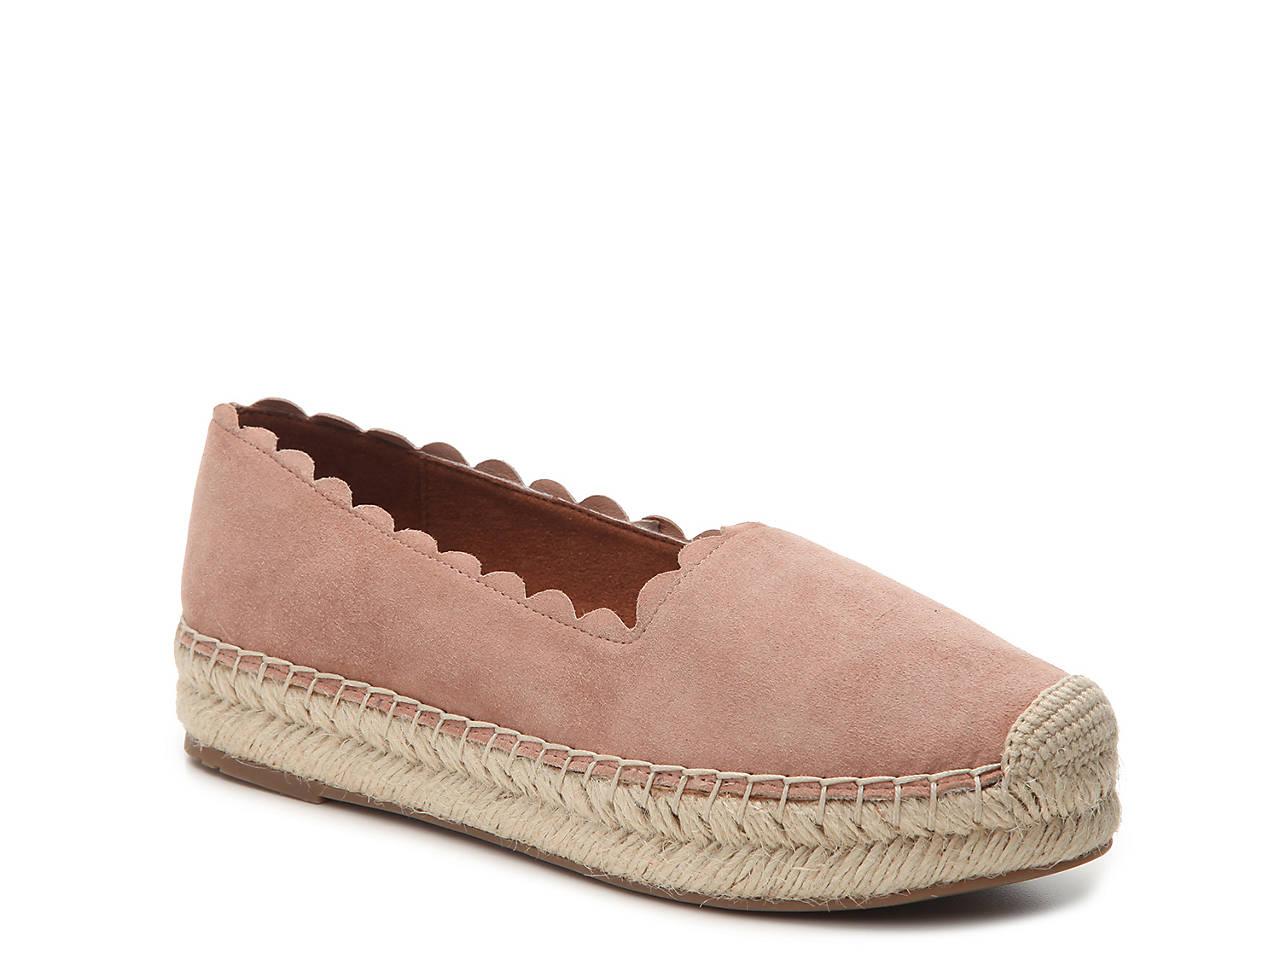 Crown Vintage Brae Espadrille Platform Slip-On Women s Shoes  0aeded386